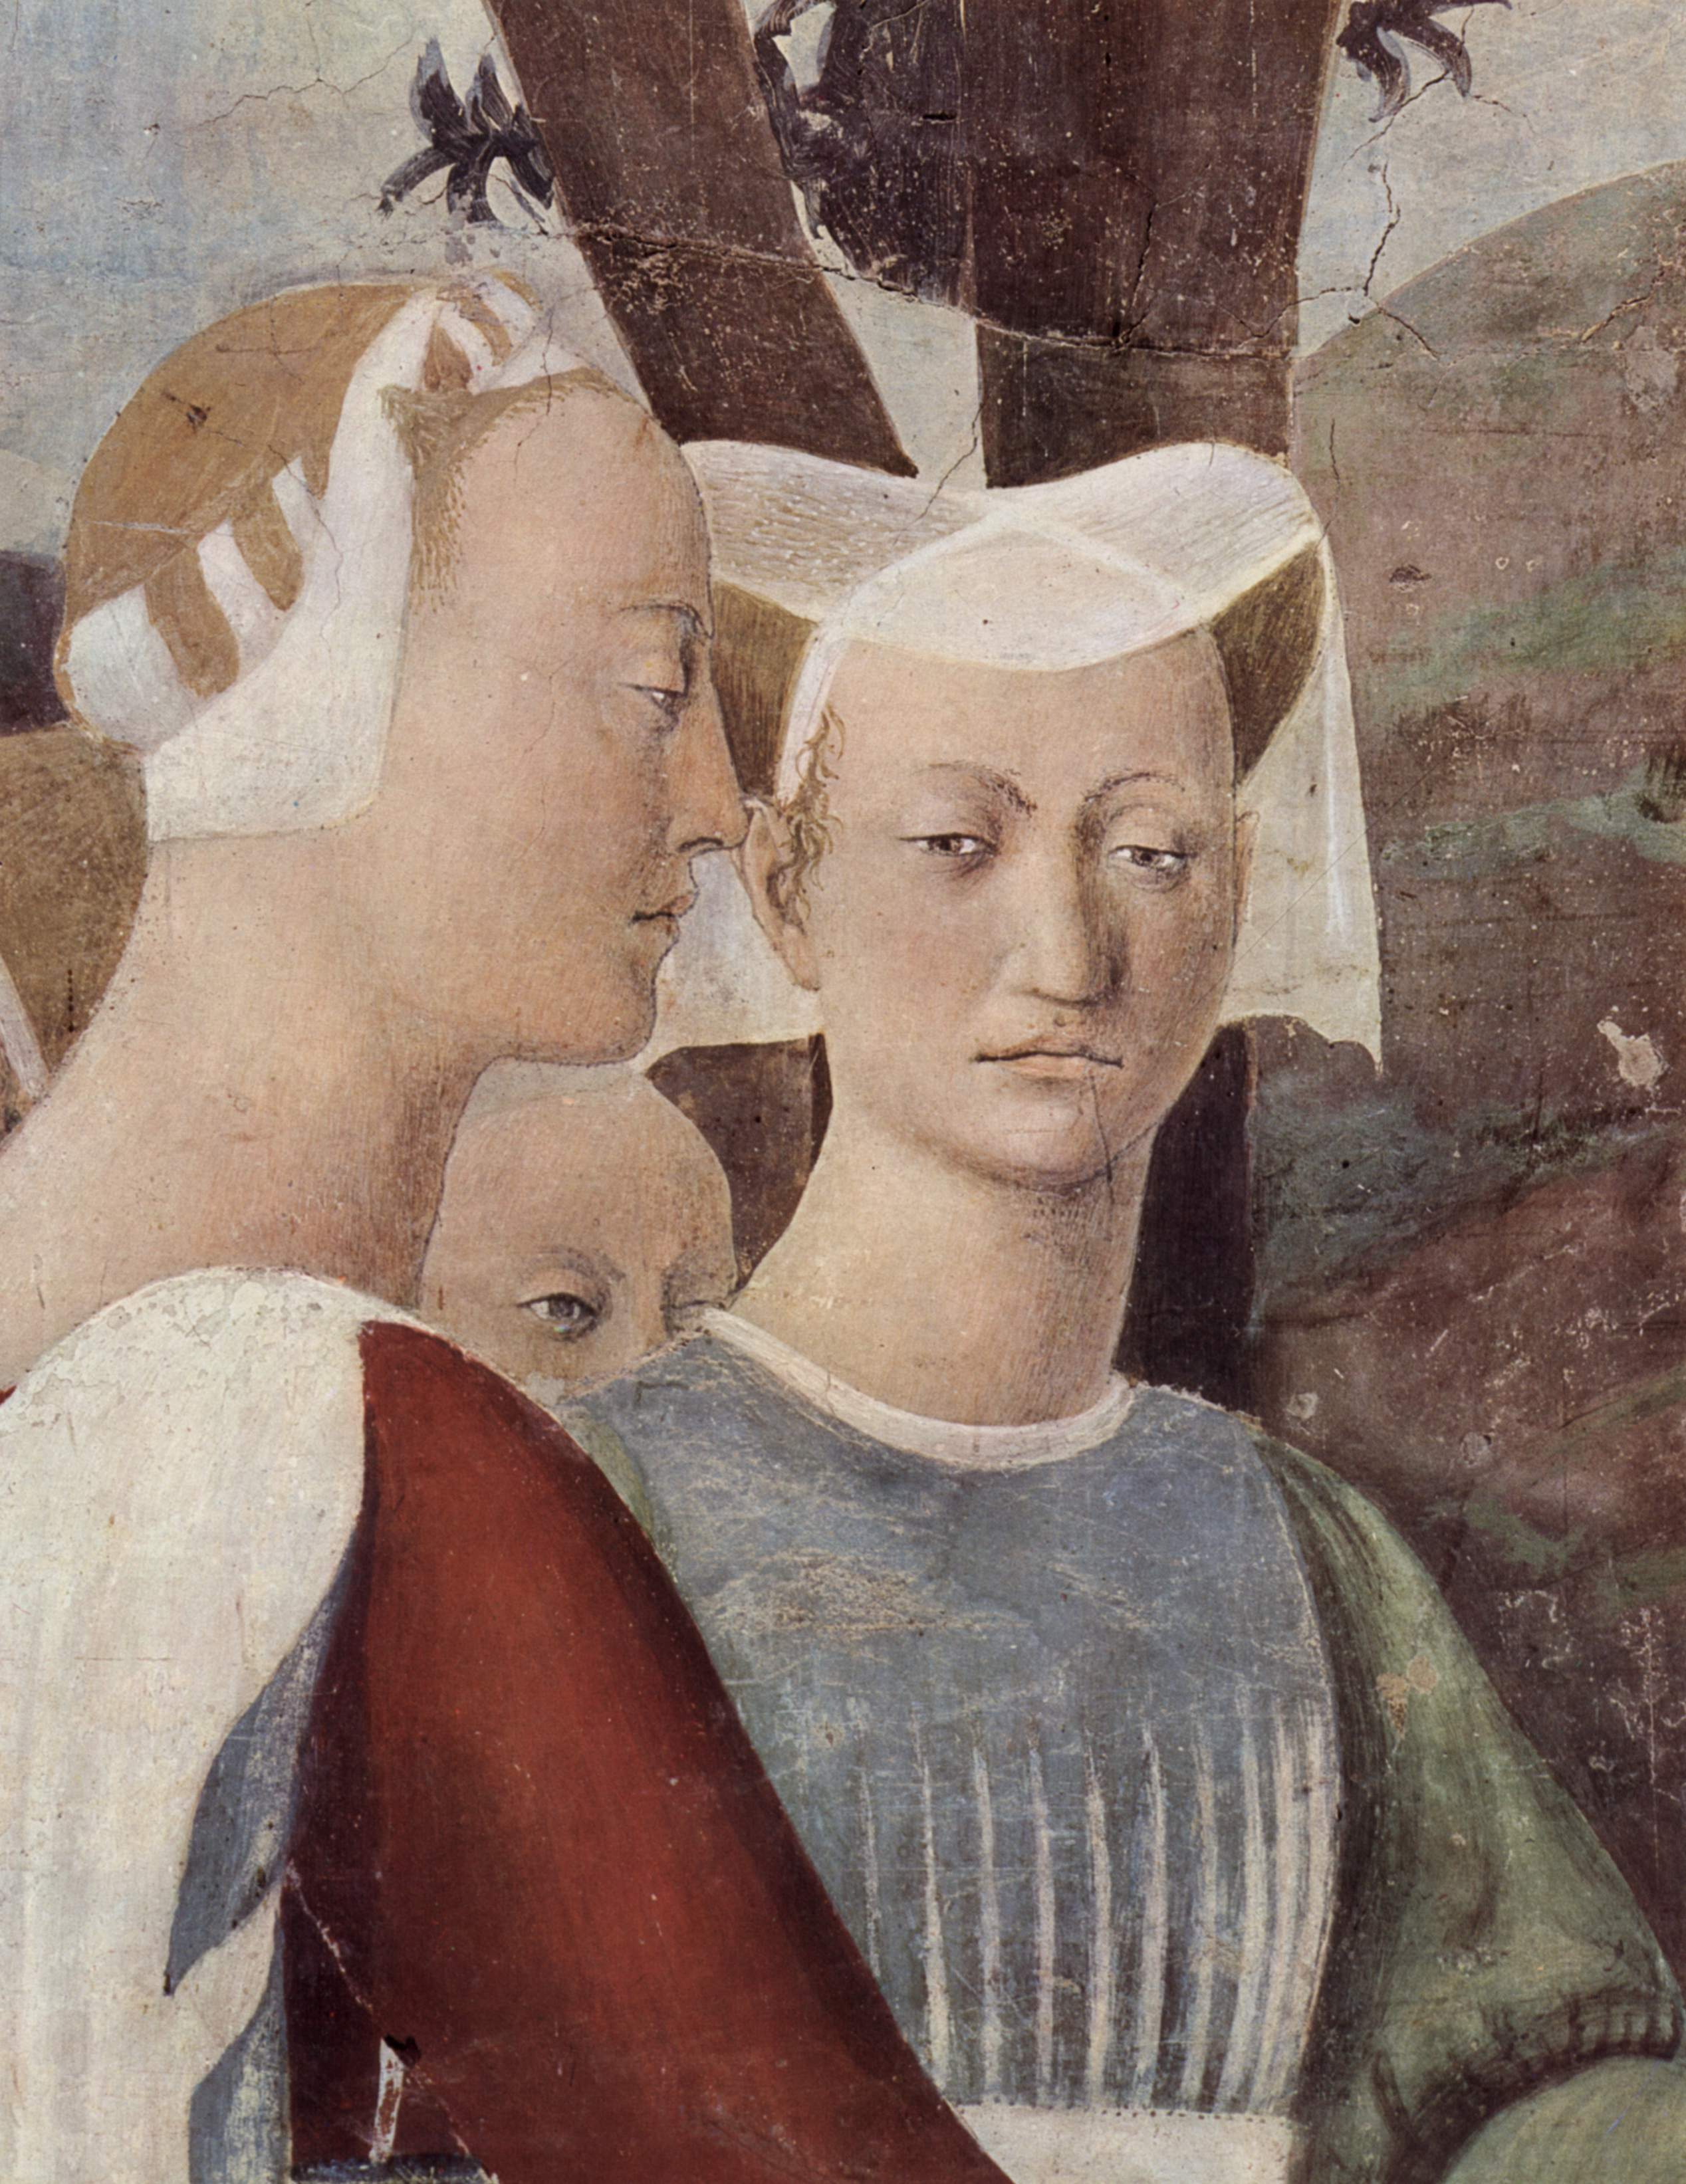 https://upload.wikimedia.org/wikipedia/commons/3/39/Piero_della_Francesca_013.jpg